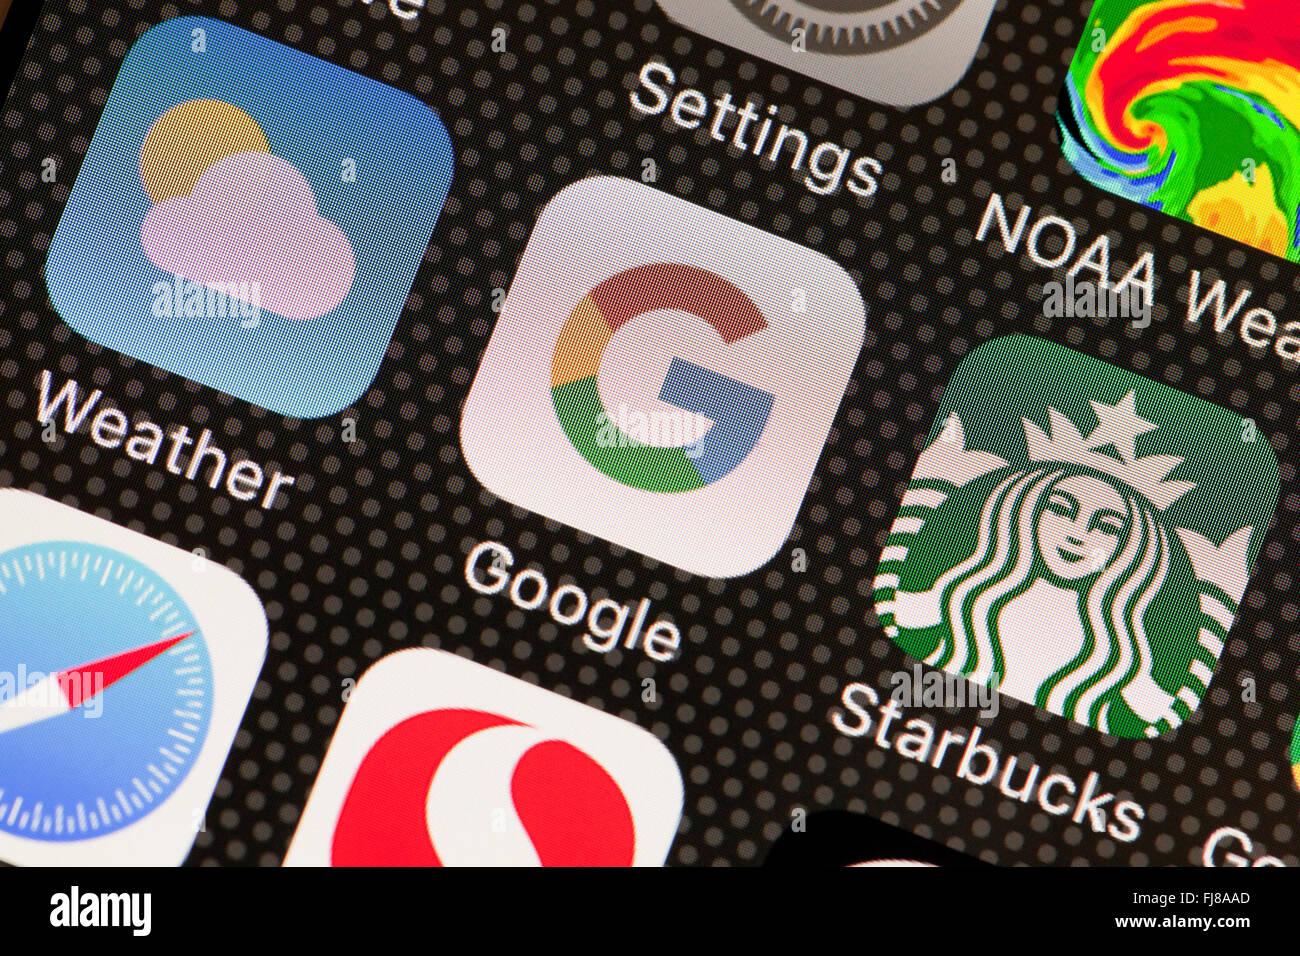 Google App en el iPhone - pantalla de EE.UU. Imagen De Stock